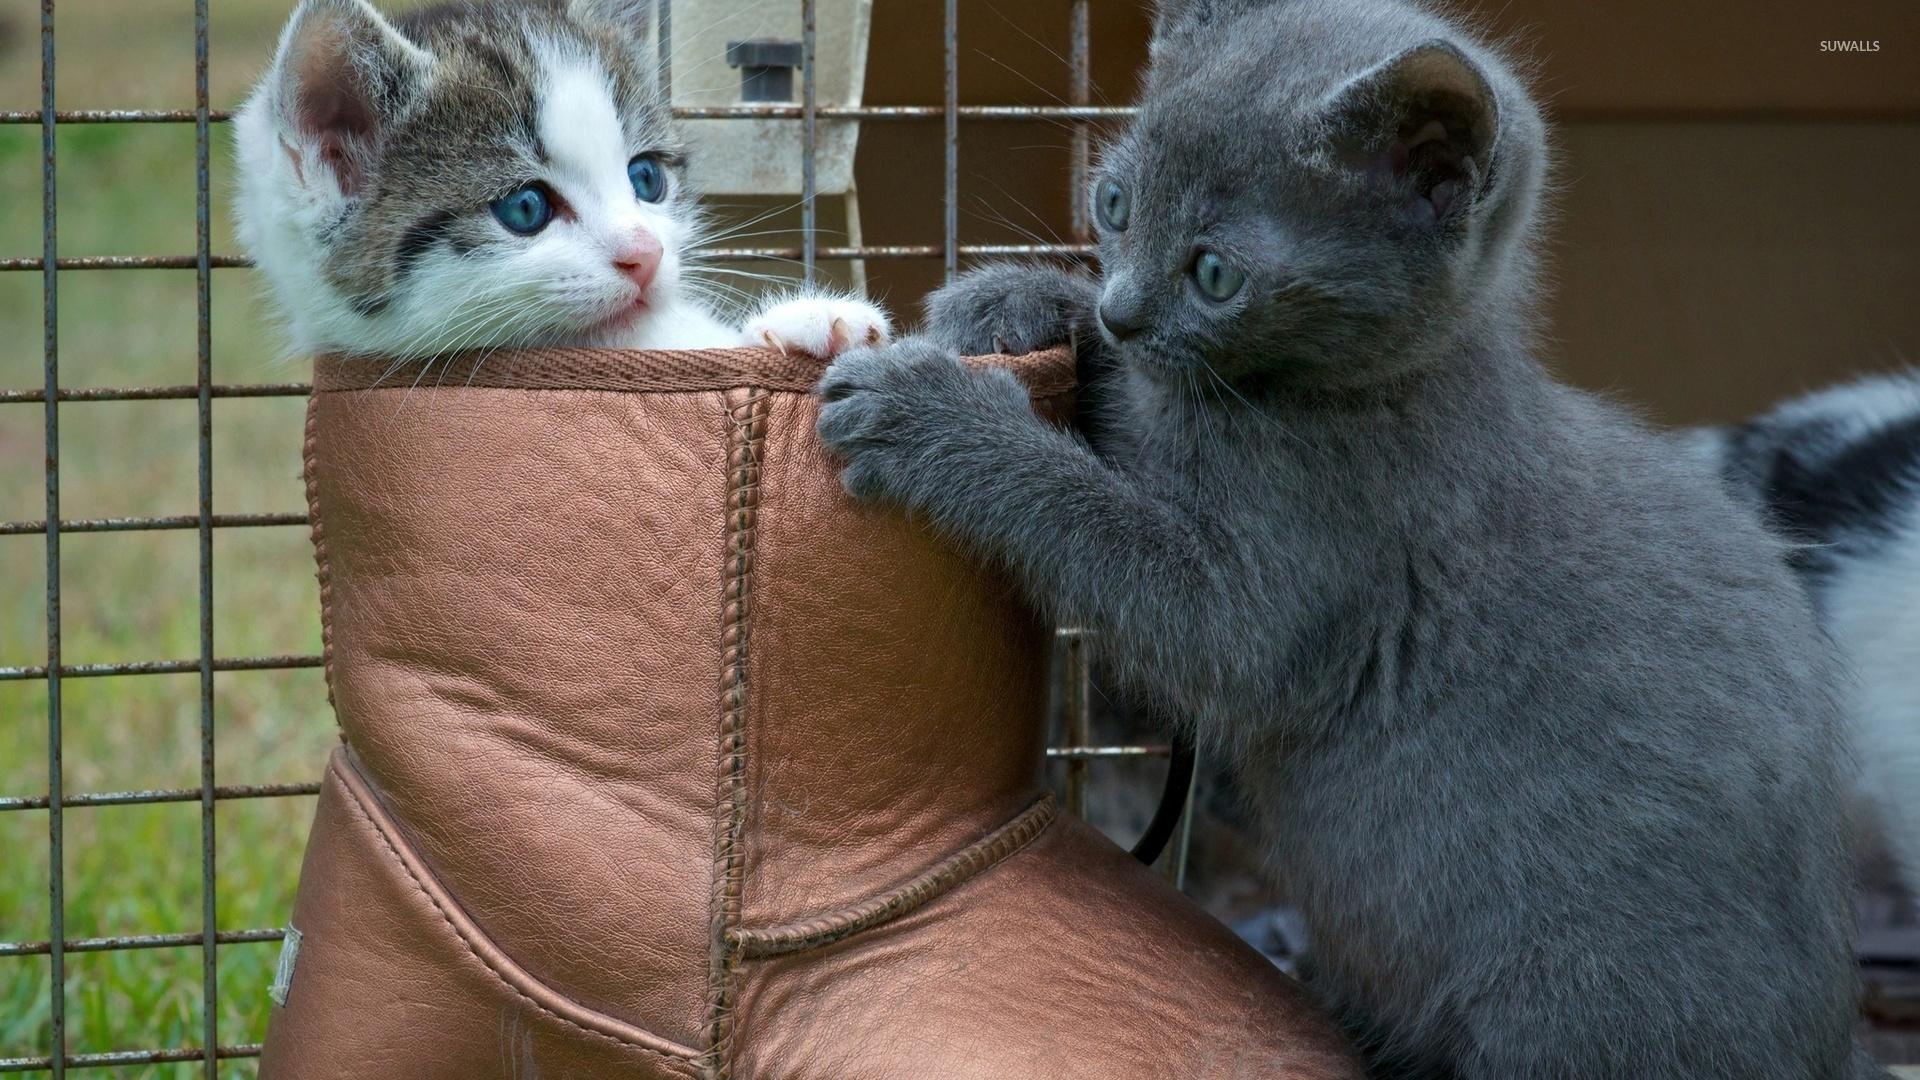 Cute kittens playing wallpaper Animal wallpapers